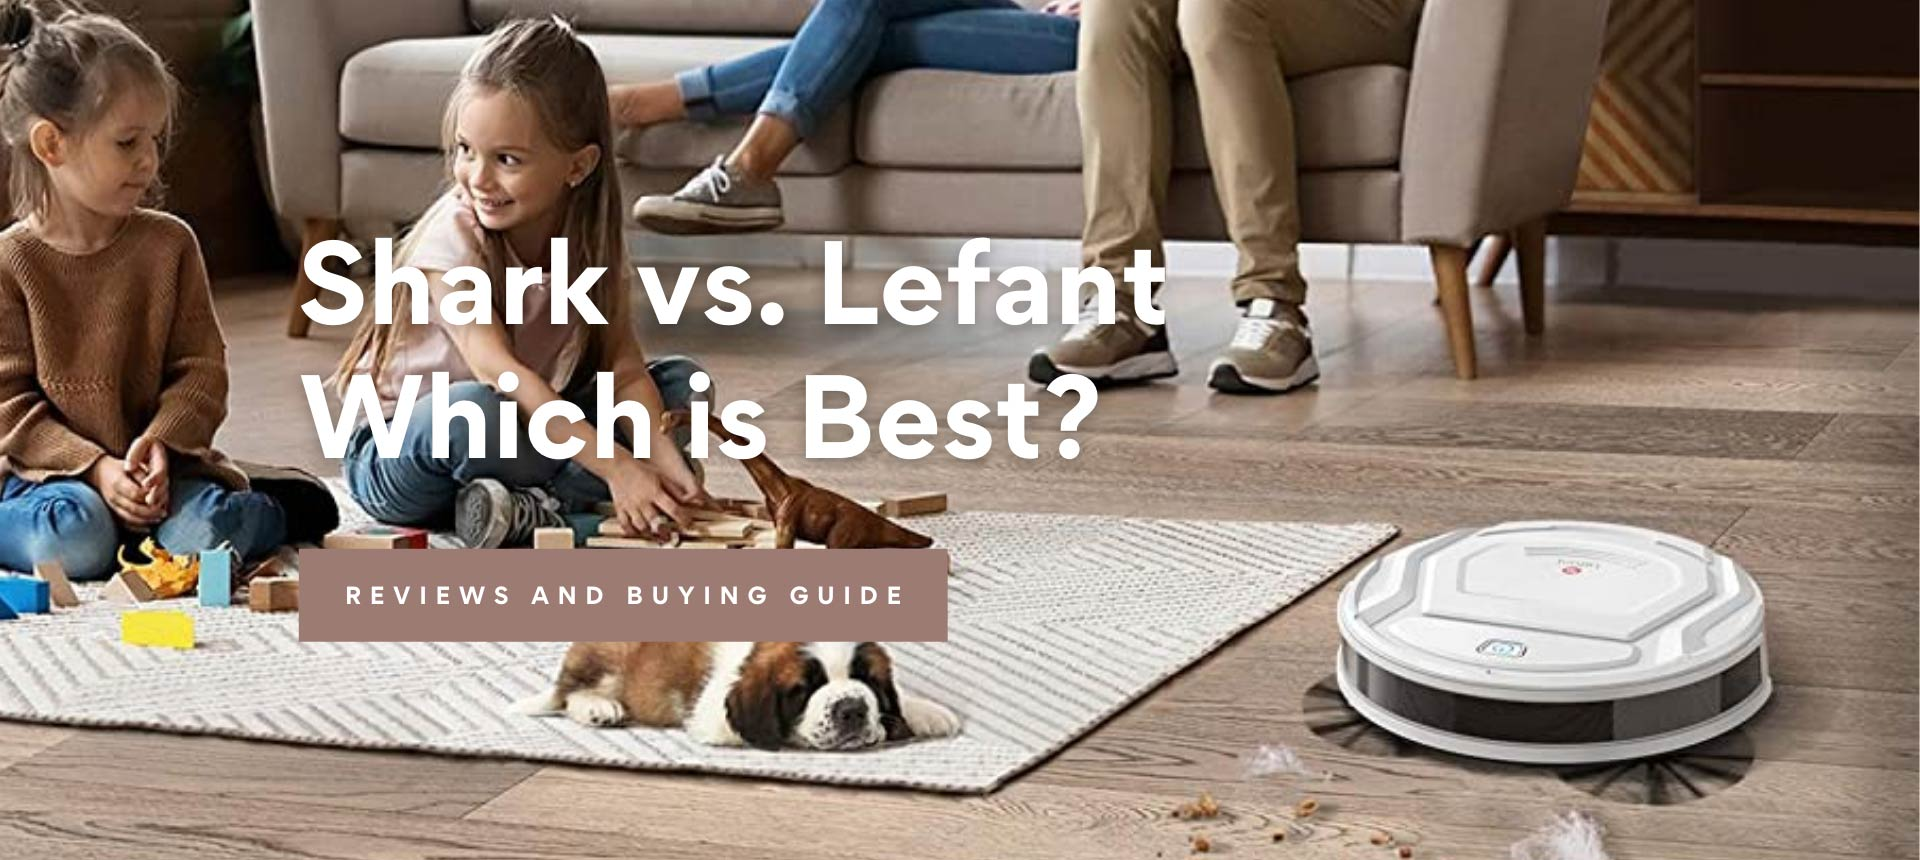 Shark vs. Lefant, Which is Best?